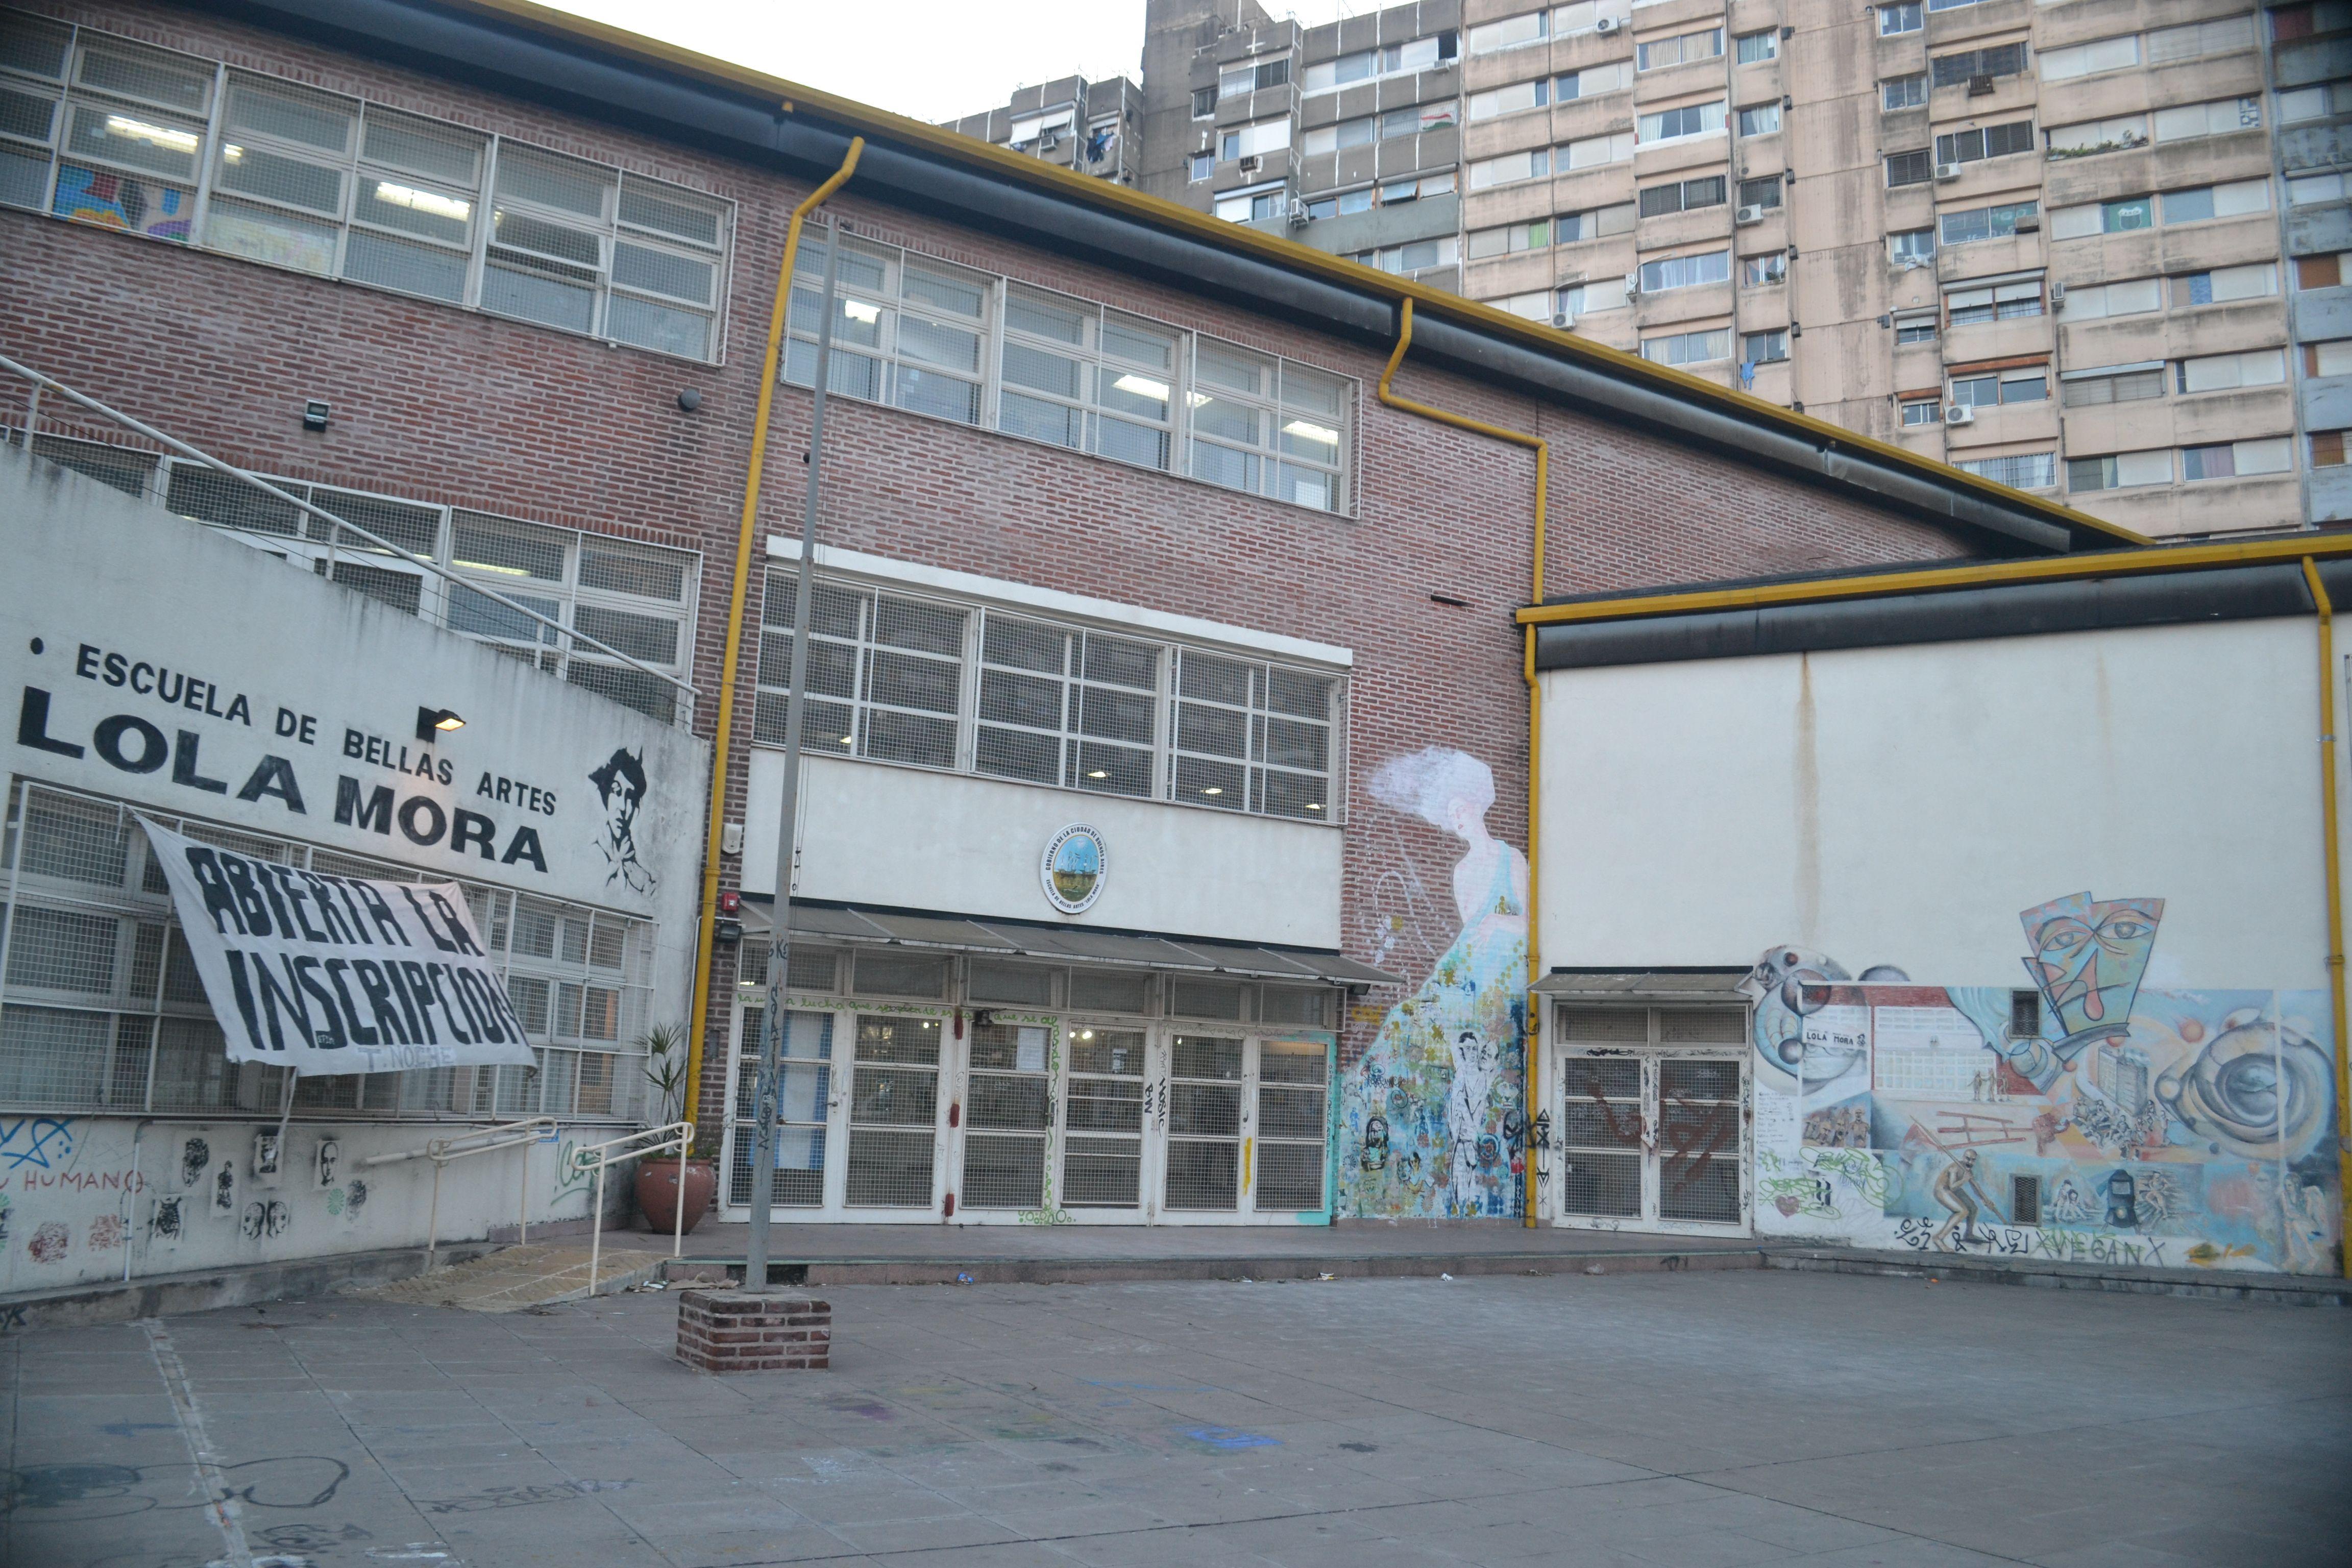 Escuela de Bellas Artes Lola Mora http://infololamora.blogspot.com.ar/